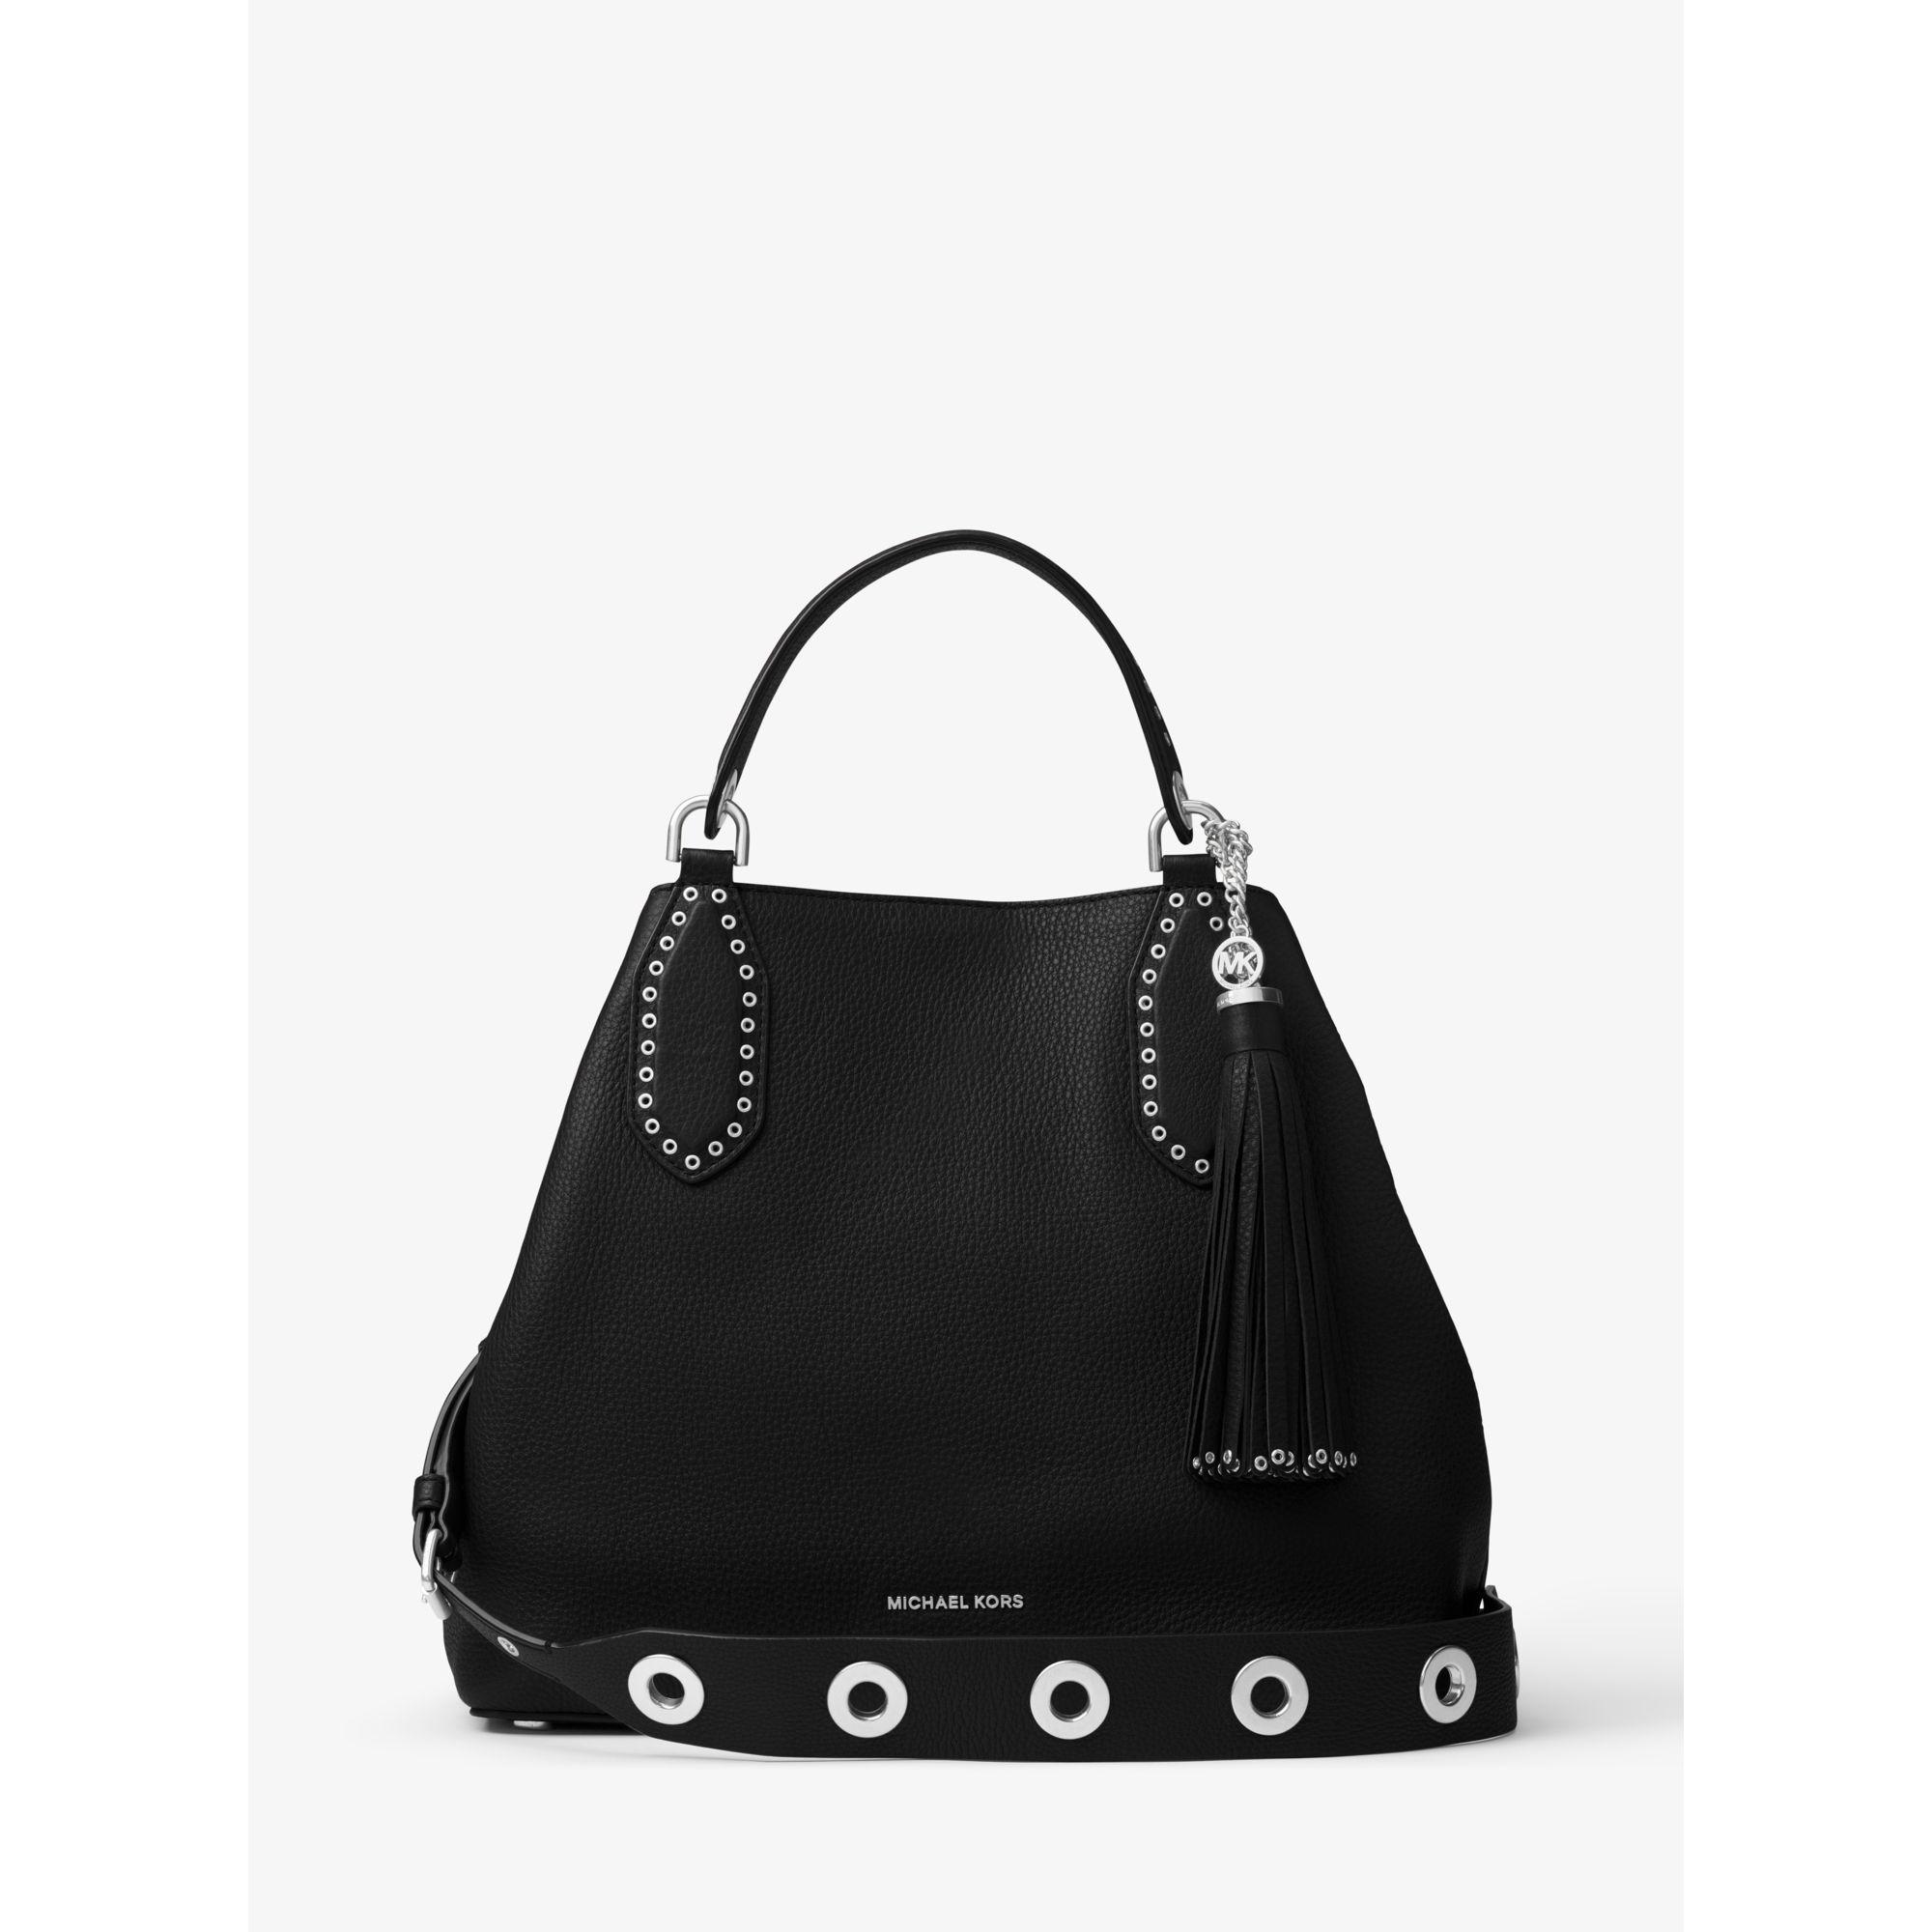 67f29f356f4e39 Michael Kors Black Brooklyn Large Leather Shoulder Bag | Stanford ...